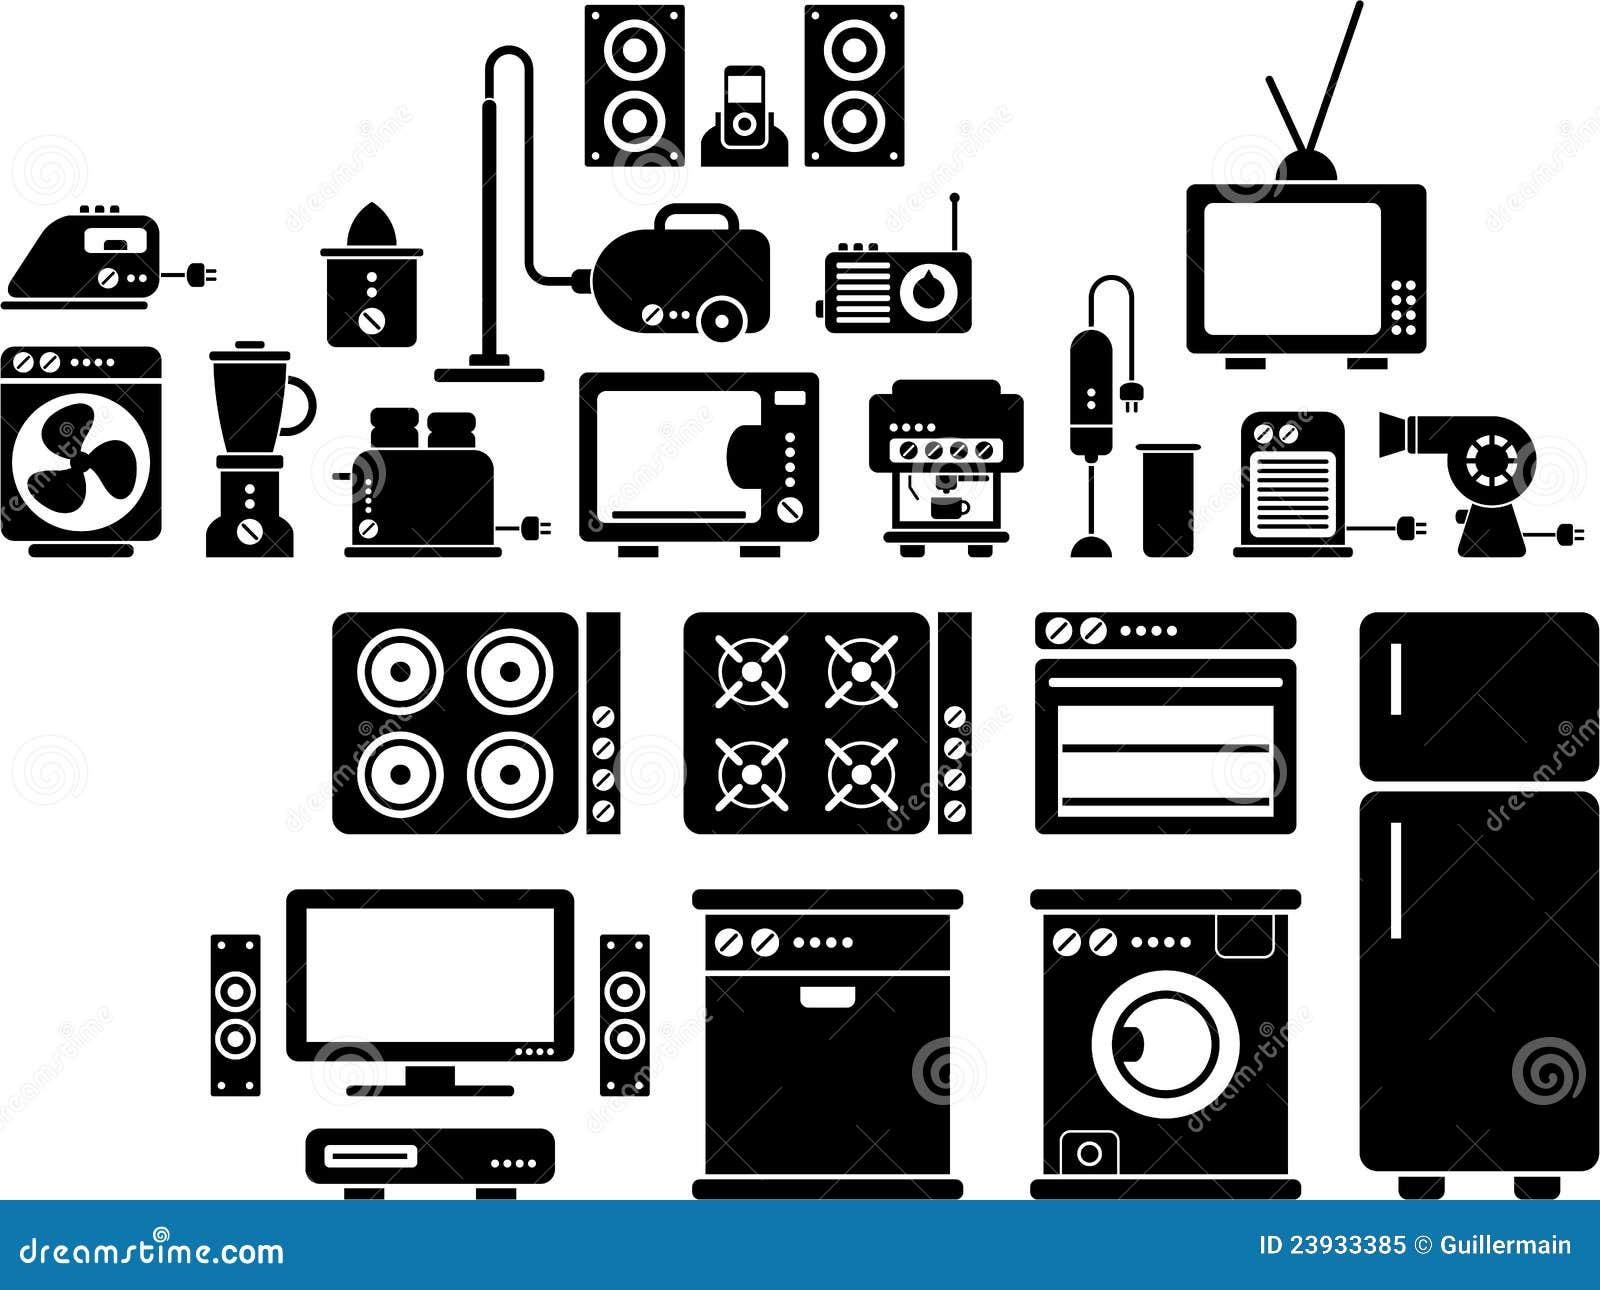 Kitchen Appliances Blogs Home Appliances Icons Royalty Free Stock Photo Image